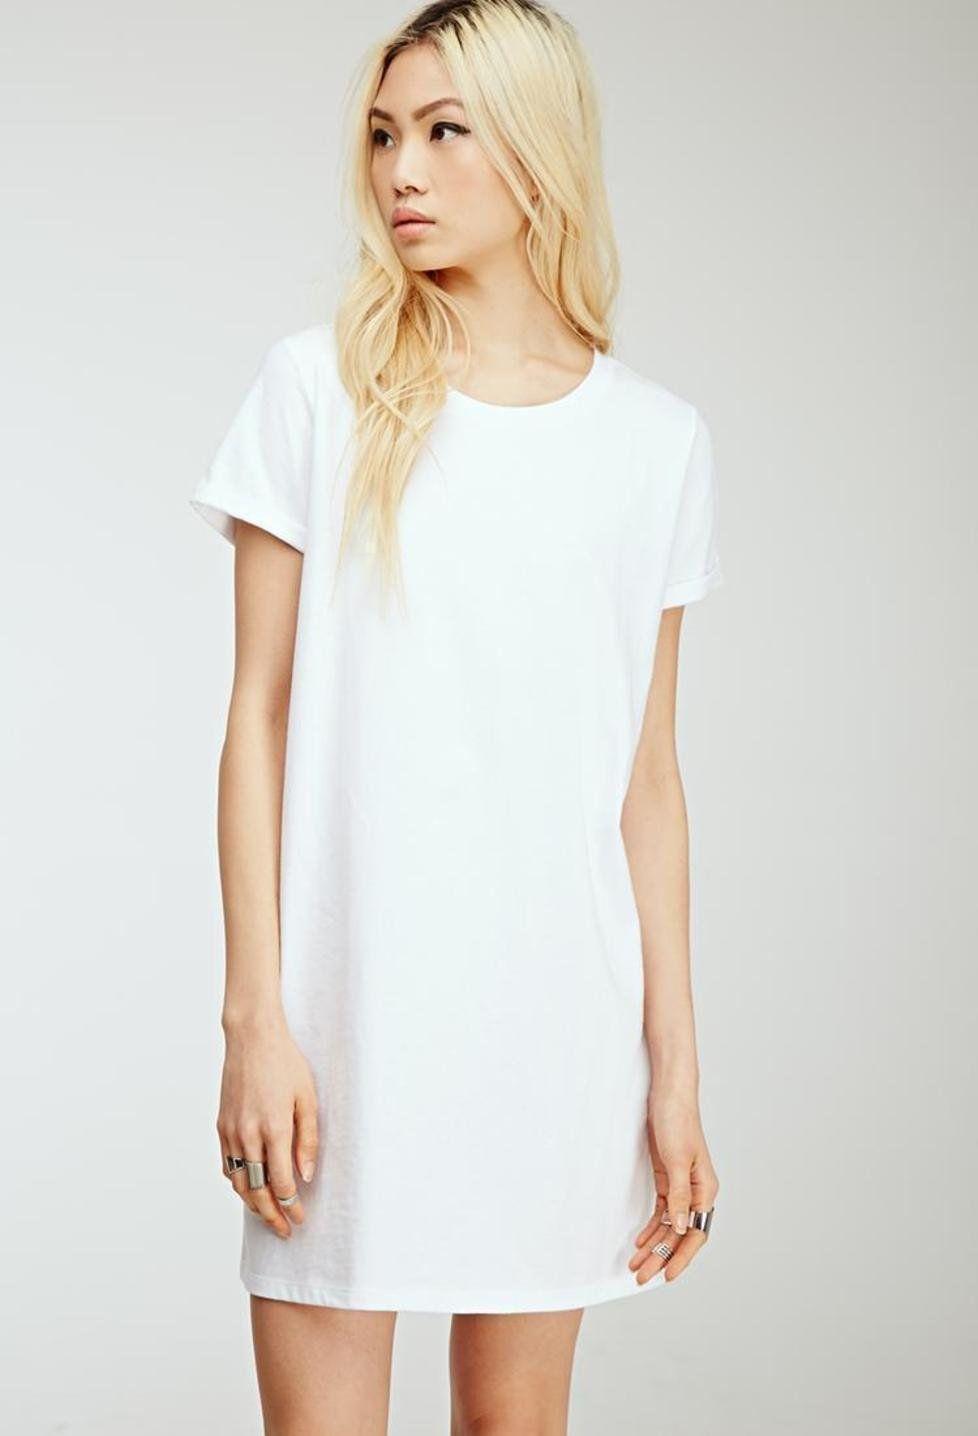 f47929f1786 Tshirt Dress Outfit, Floral Shirt Dress, White T Shirt Dress, Dress Outfits,